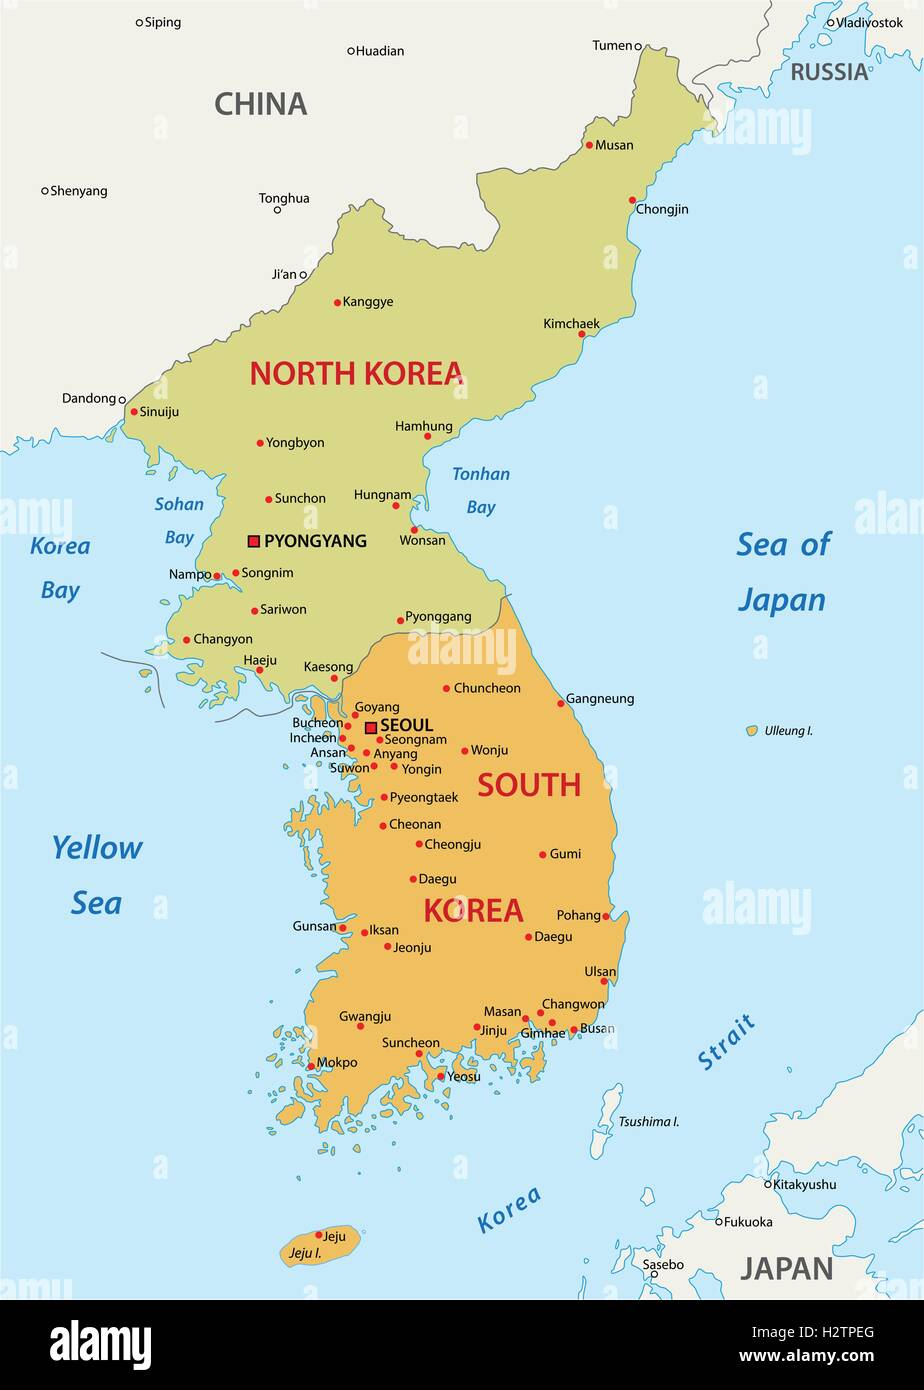 Korean Peninsula Map Stock Photos & Korean Peninsula Map Stock ...